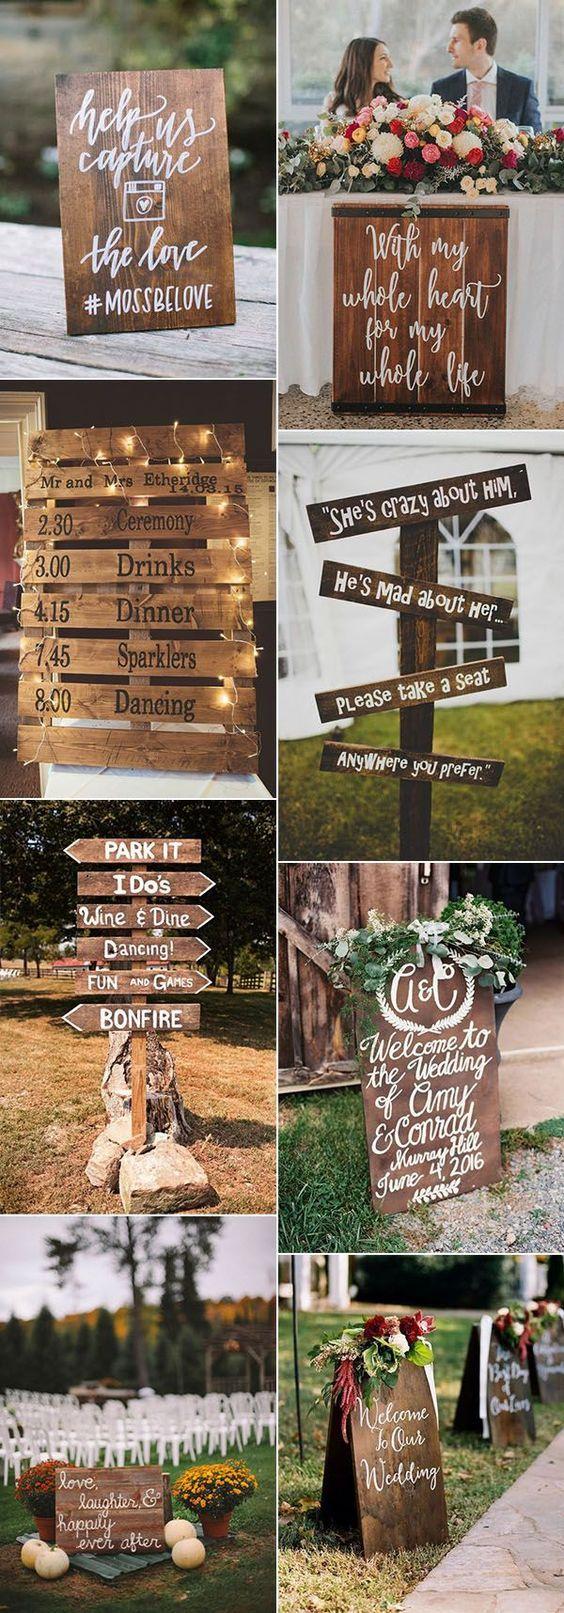 Pretty budgetfriendly wedding decorating ideas easytodo rustic